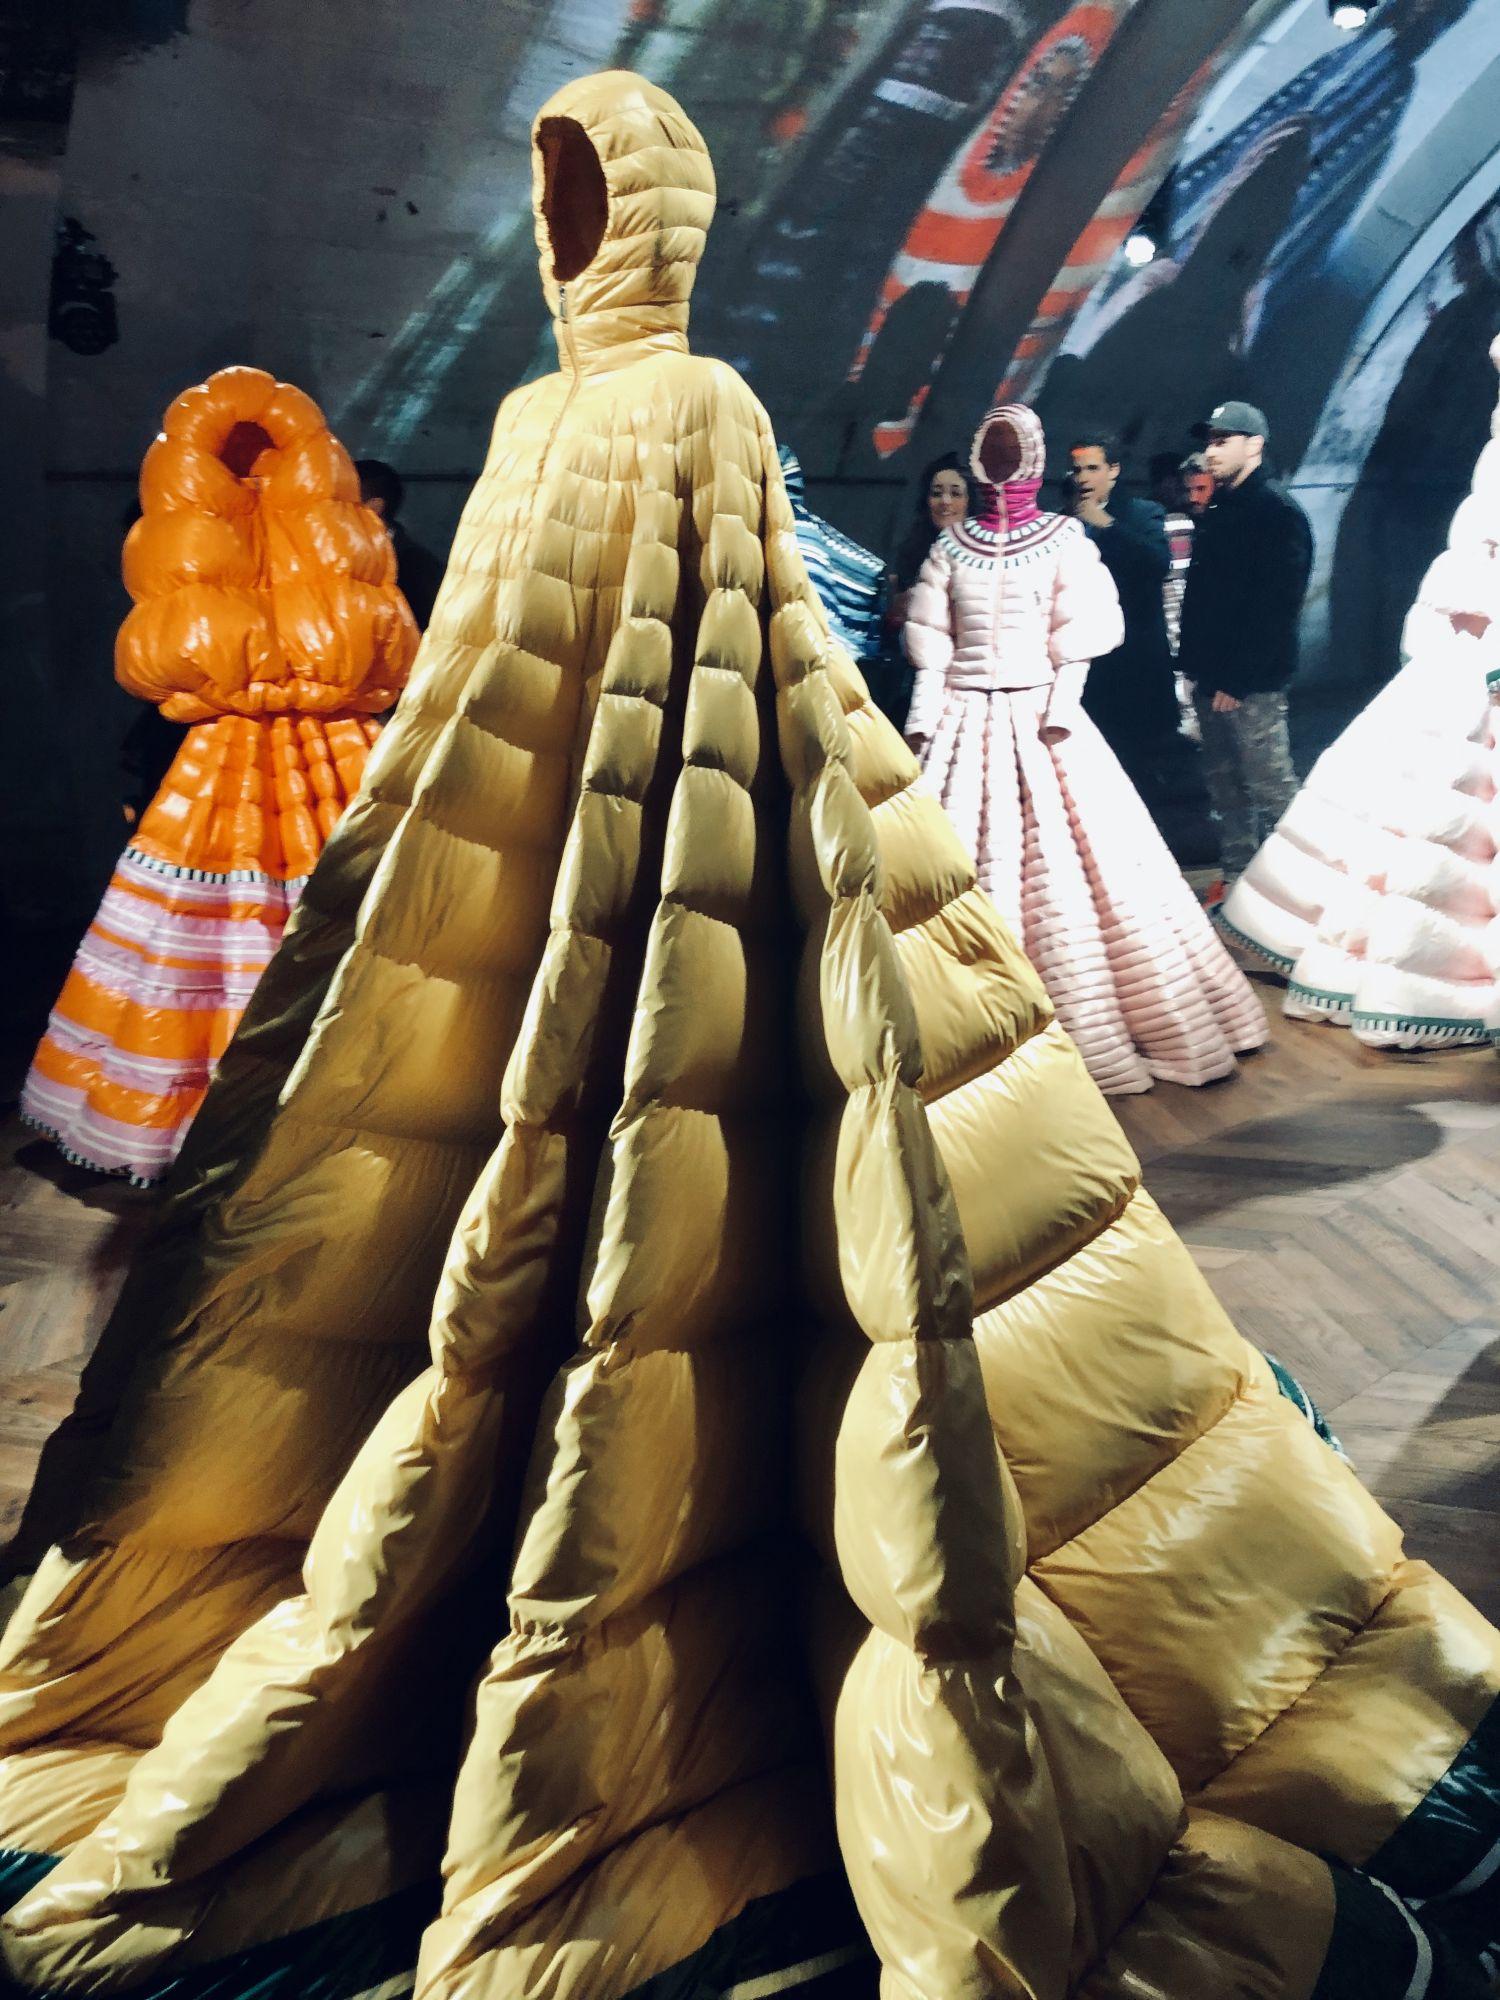 Milan Fashion Week Fall/Winter 2019: Day 1 Highlights